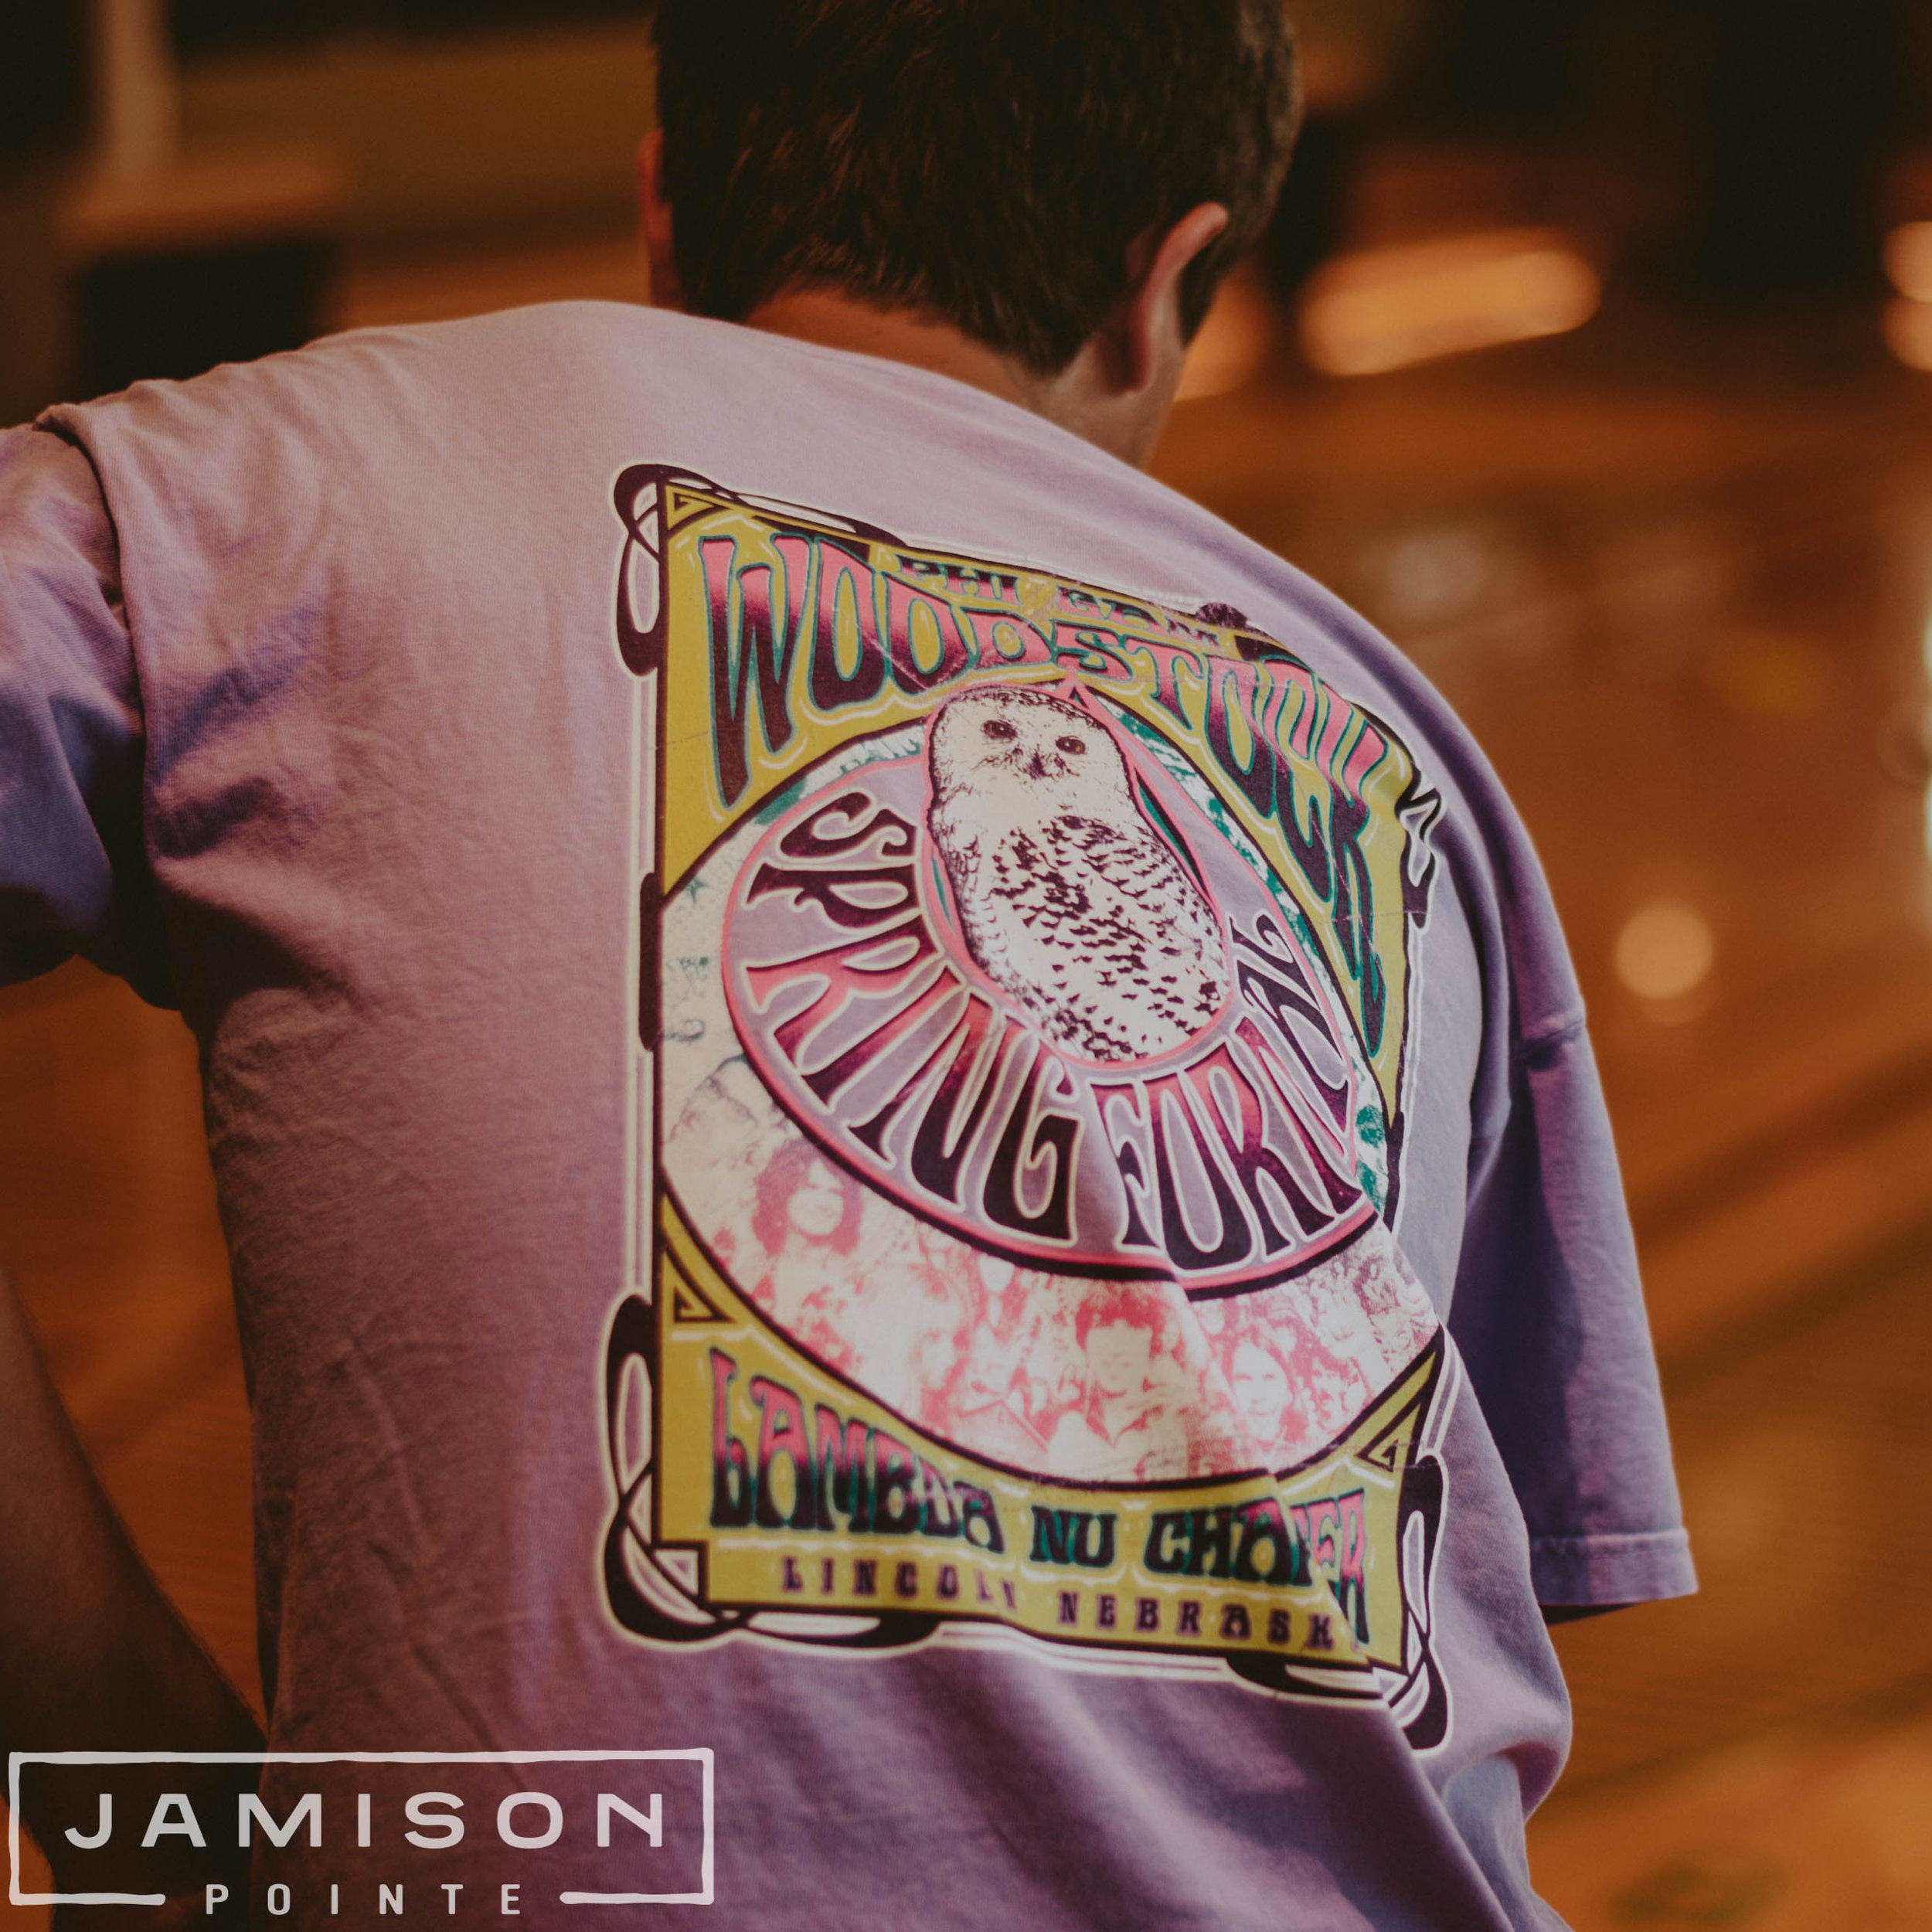 Phi Gam Woodstock Tshirt